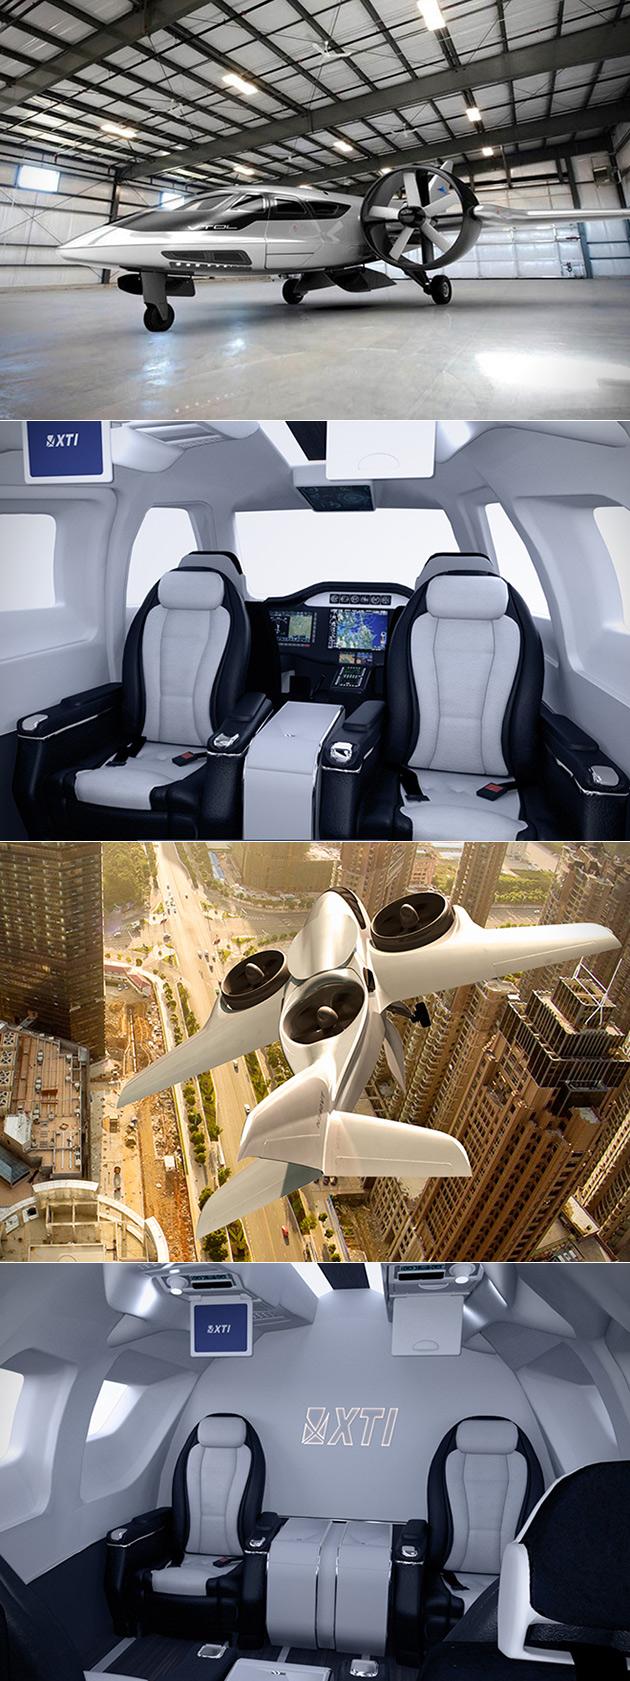 TriFan 600 Personal Jet